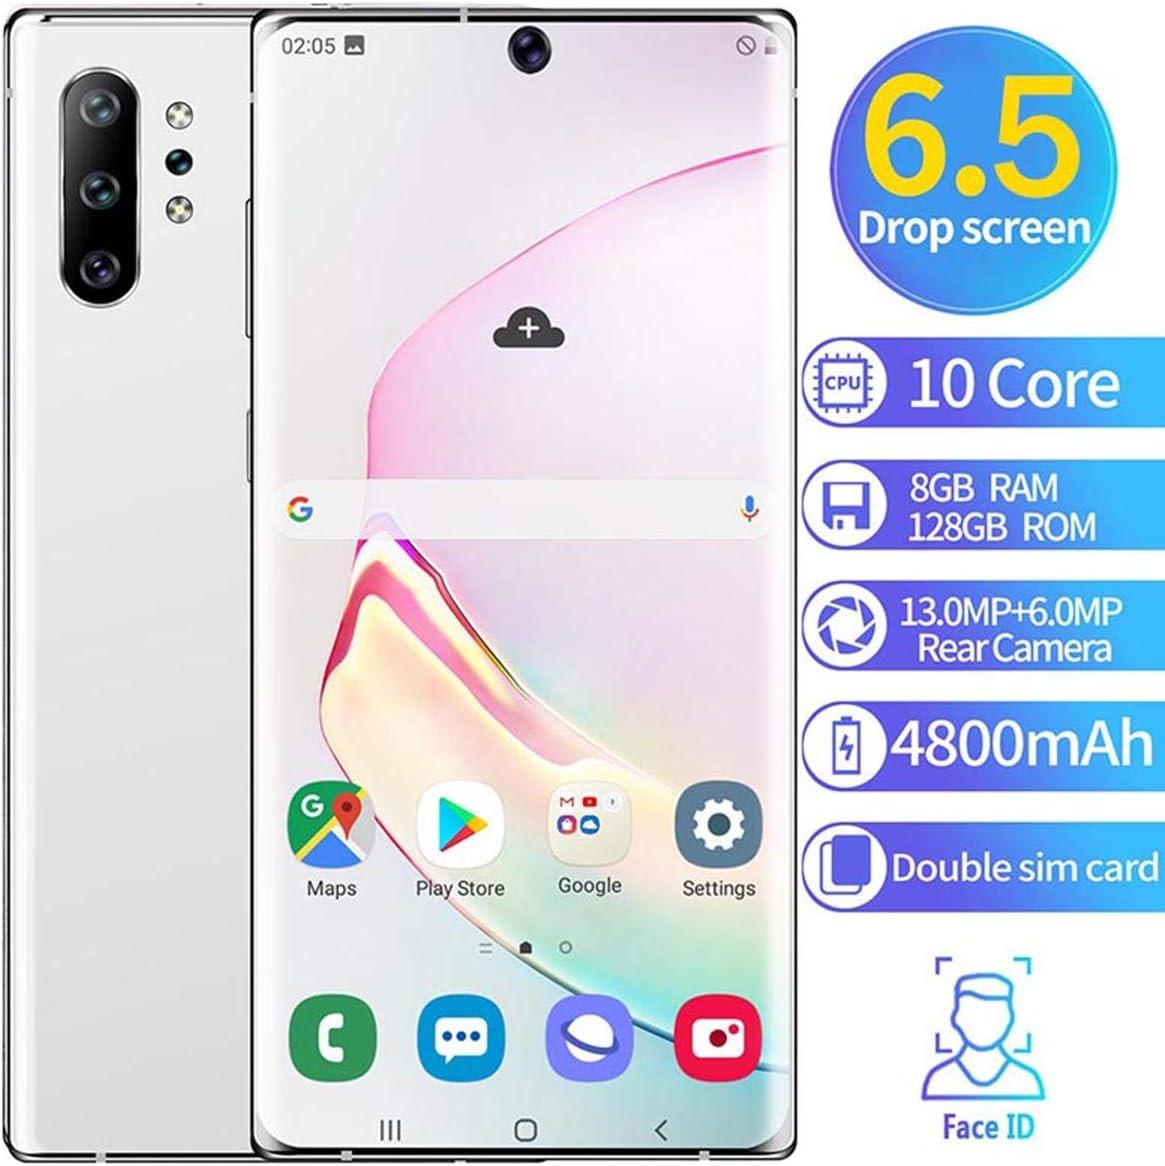 XGLL Teléfono Móvil 6.5 Pulgadas FHD 10 Core 8GB RAM + 128GB ROM Android 9.1 4800Mah Batería Dual SIM Moviles Libres Indestructibles Smartphone,Blanco